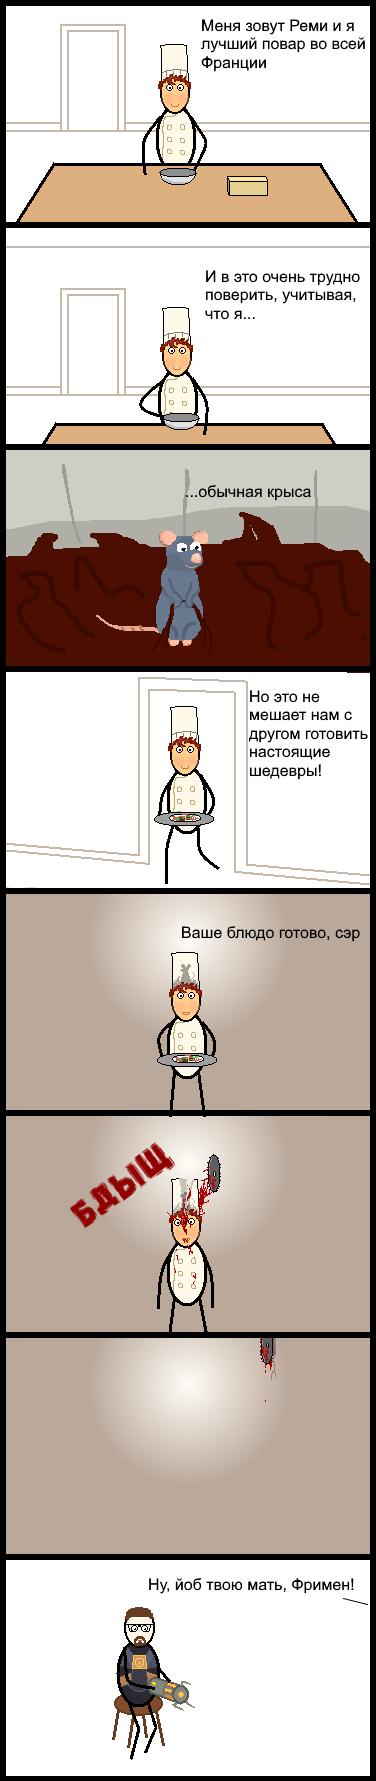 Кулинарное Комиксы, Cynicmansion, Paint, Длиннопост